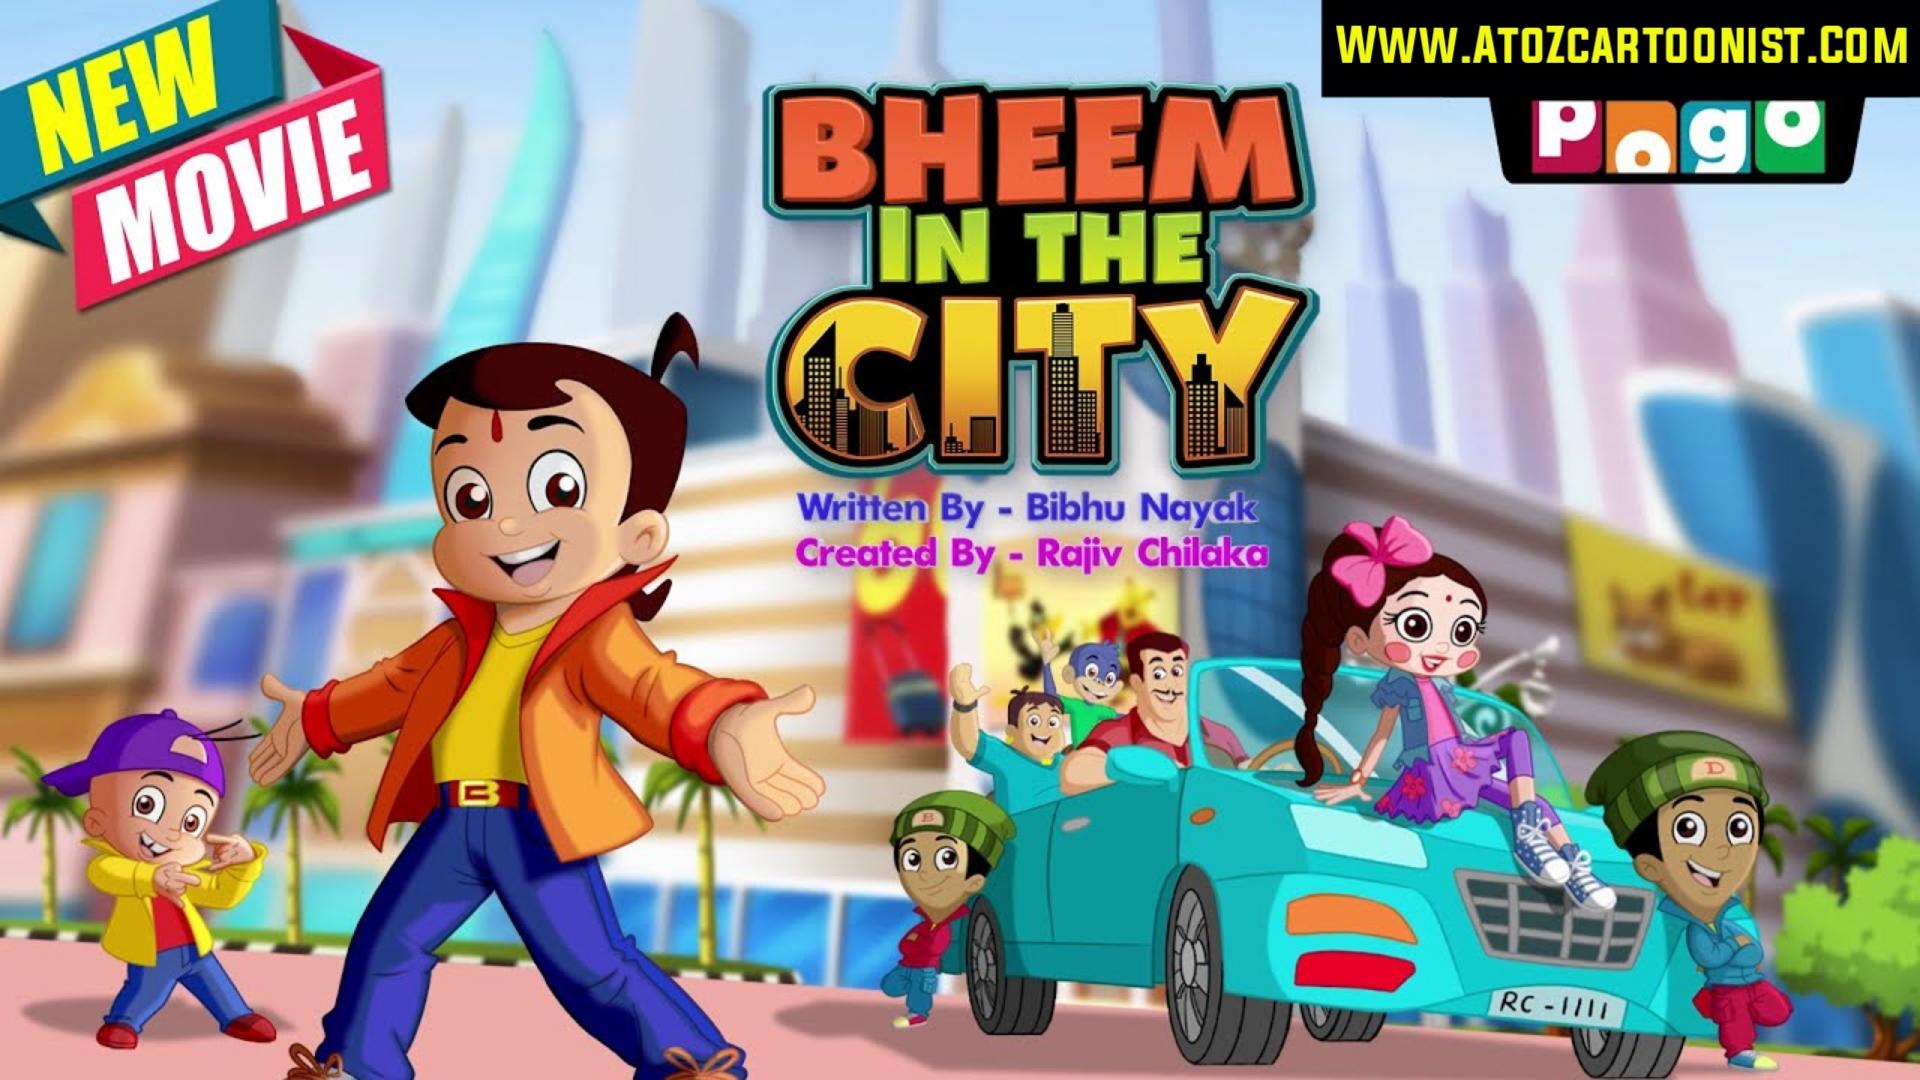 CHHOTA BHEEM – BHEEM IN THE CITY FULL MOVIE IN HINDI & TAMIL DOWNLOAD (480P, 720P & 1080P)